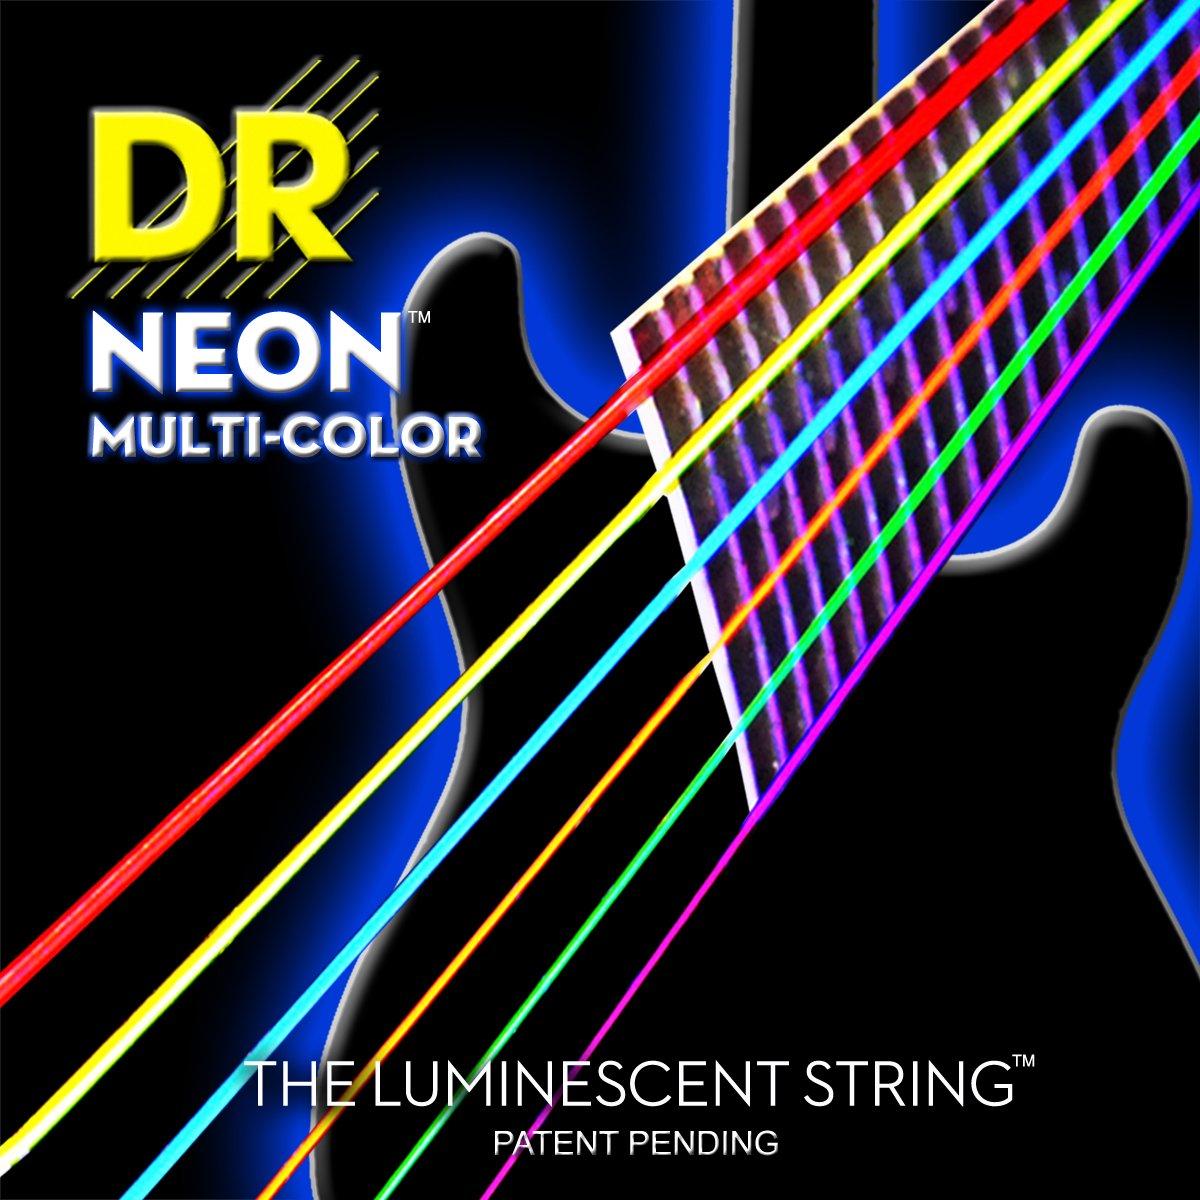 DR Strings NMCE-10 DR NEON Electric Strings, Medium, Multi-Color